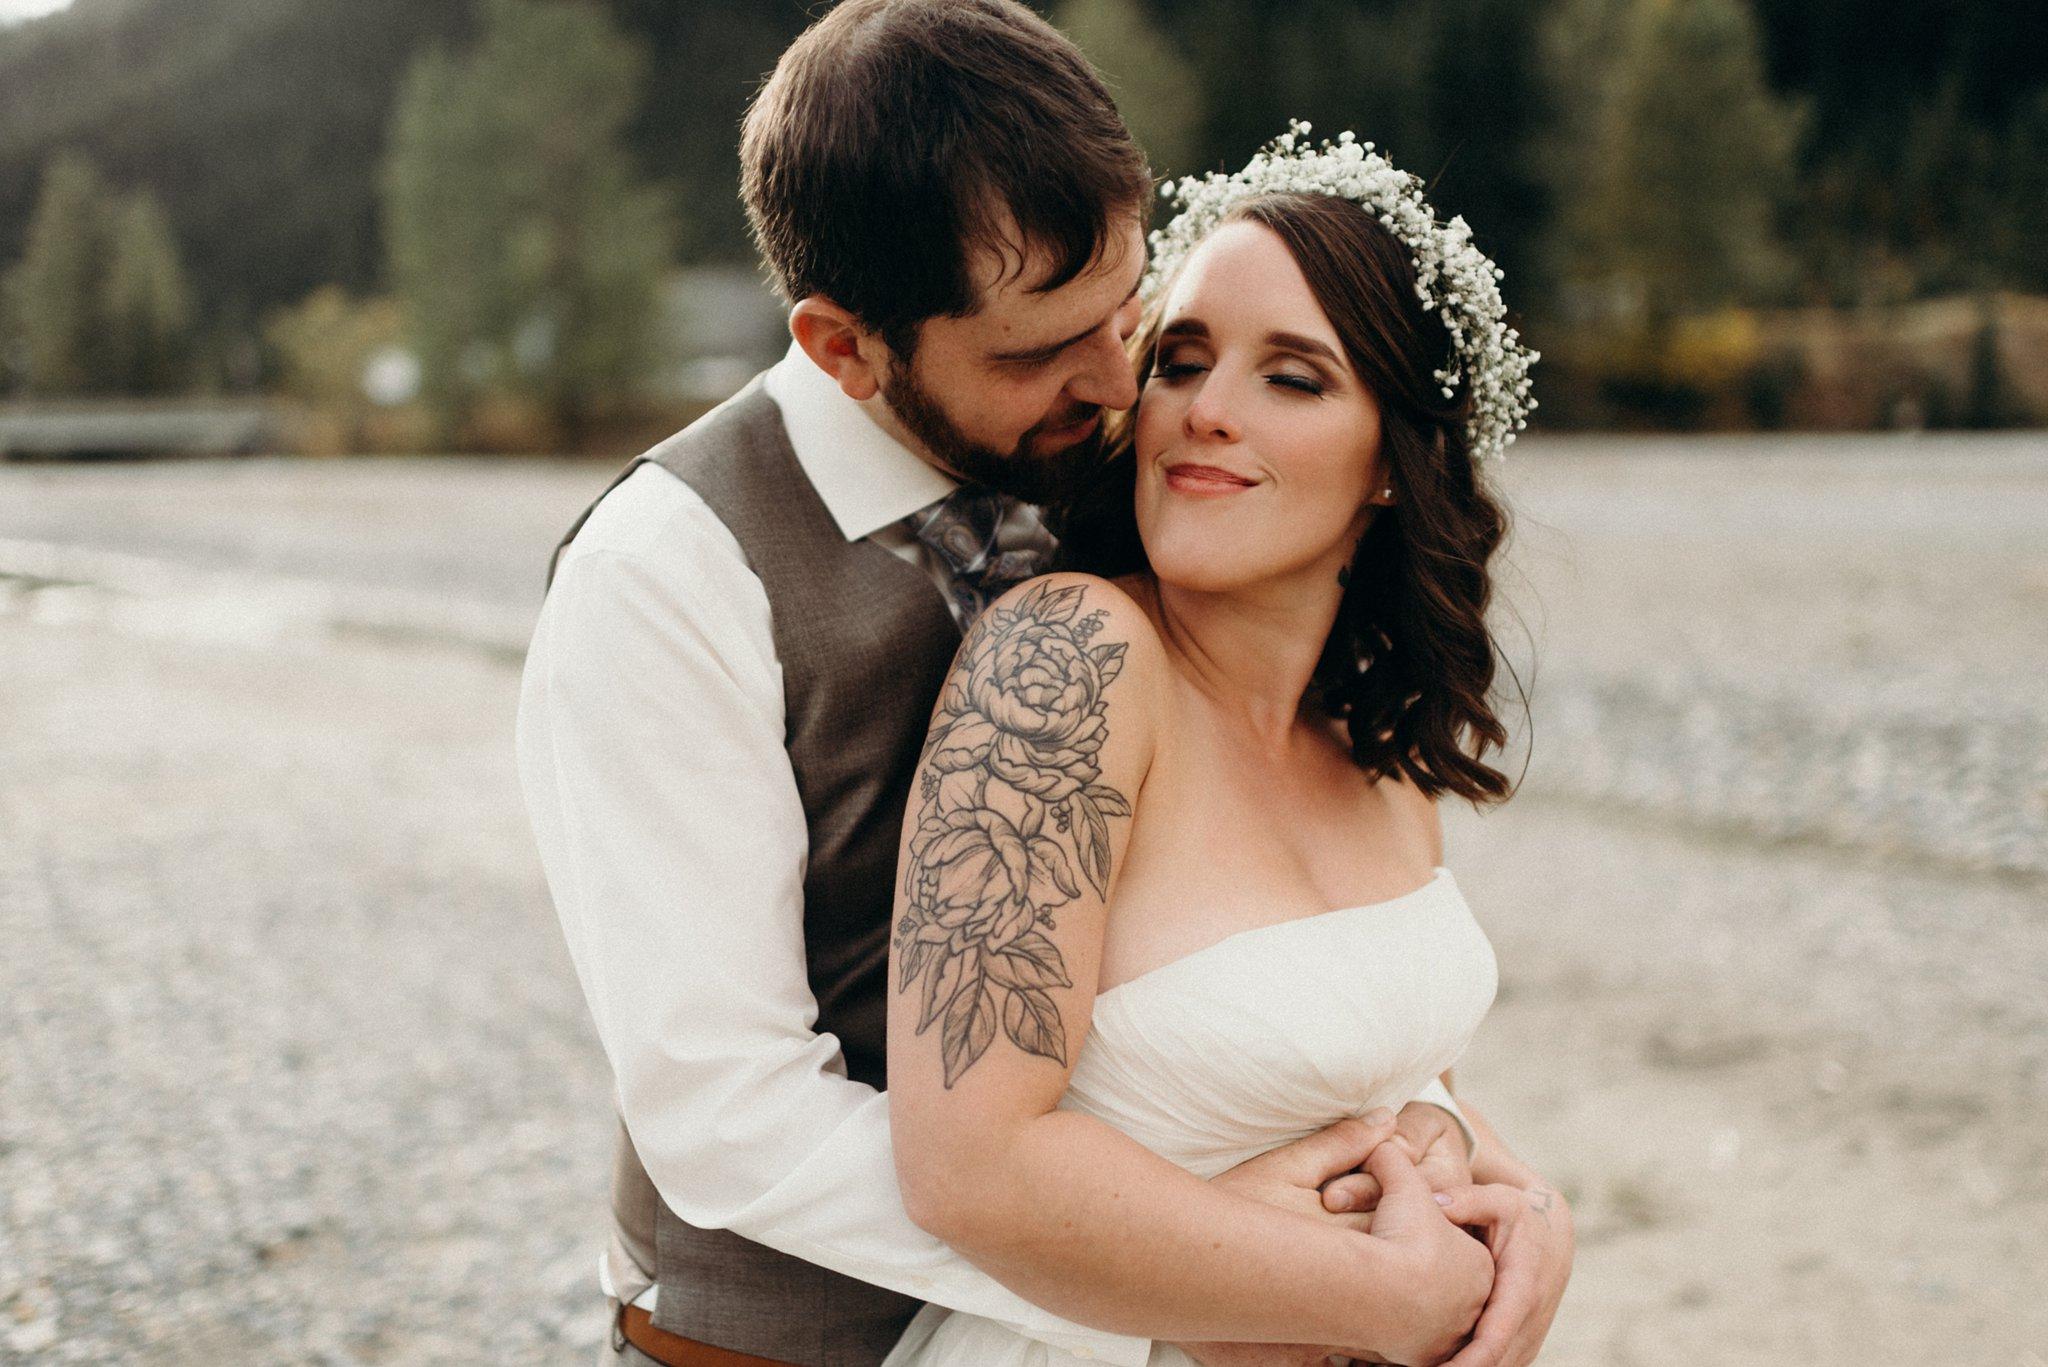 kaihla_tonai_intimate_wedding_elopement_photographer_6907.jpg